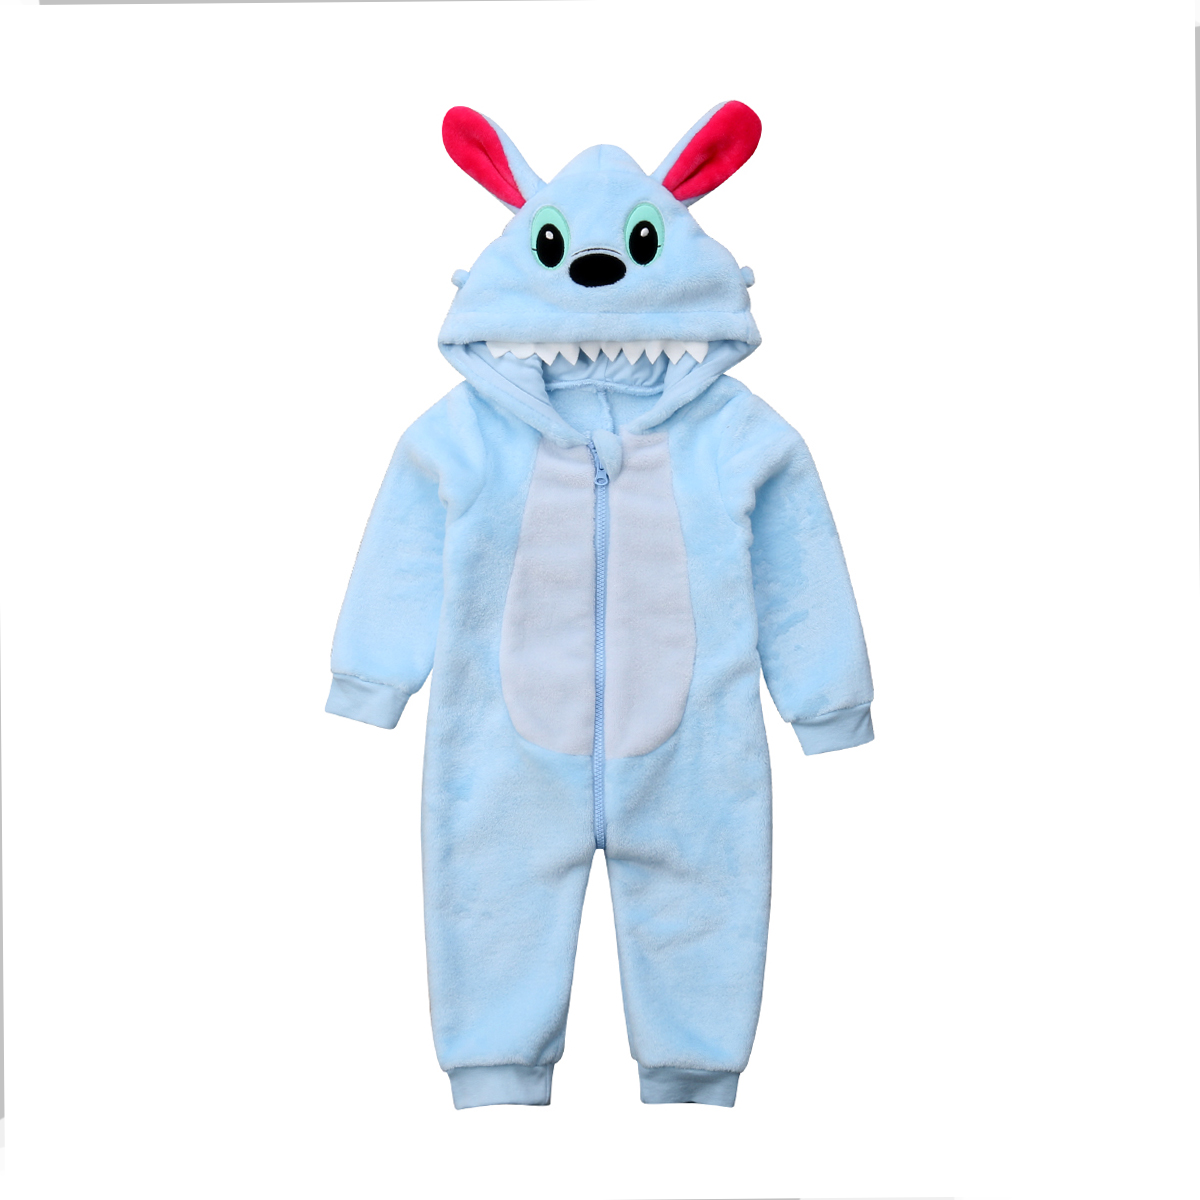 Newborn Kids Baby Boys Long Sleeve Stitch Zipper Hooded Romper Jumpsuit Outfits